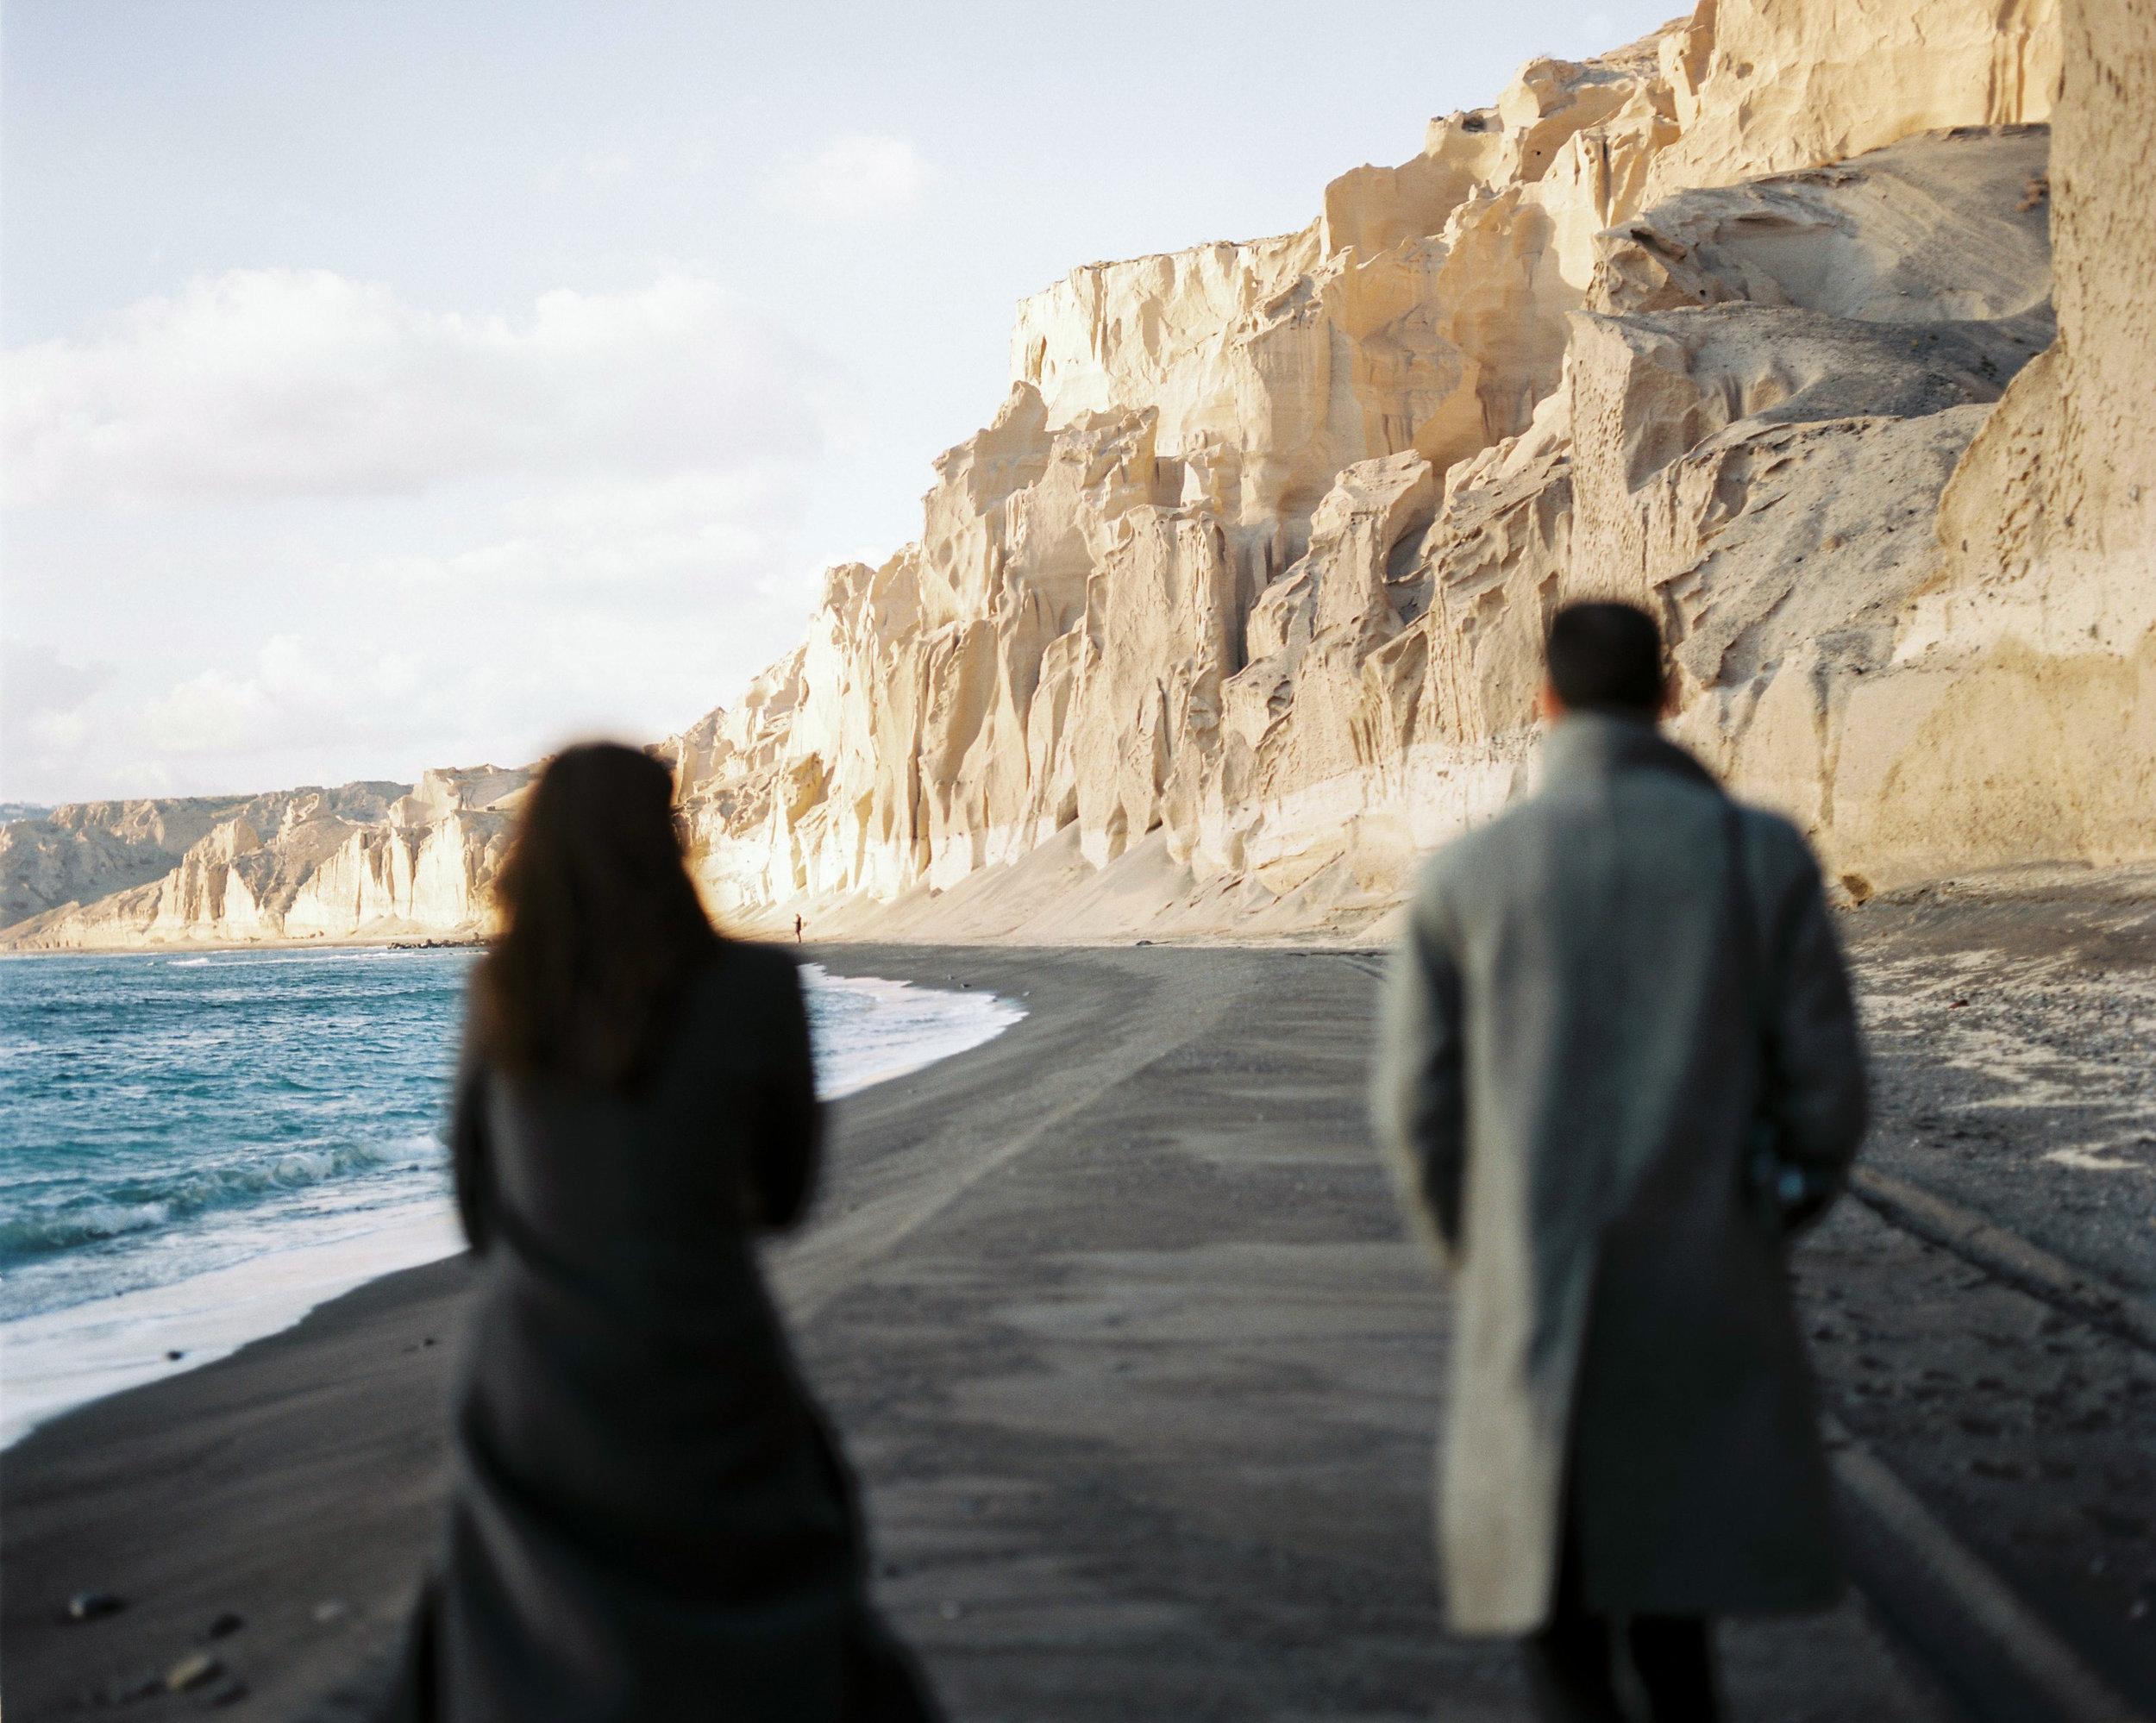 celinehamelin-photographe-couple-argentique-loversession-grece-santorin-argentique-filmphotography-greece18.jpg